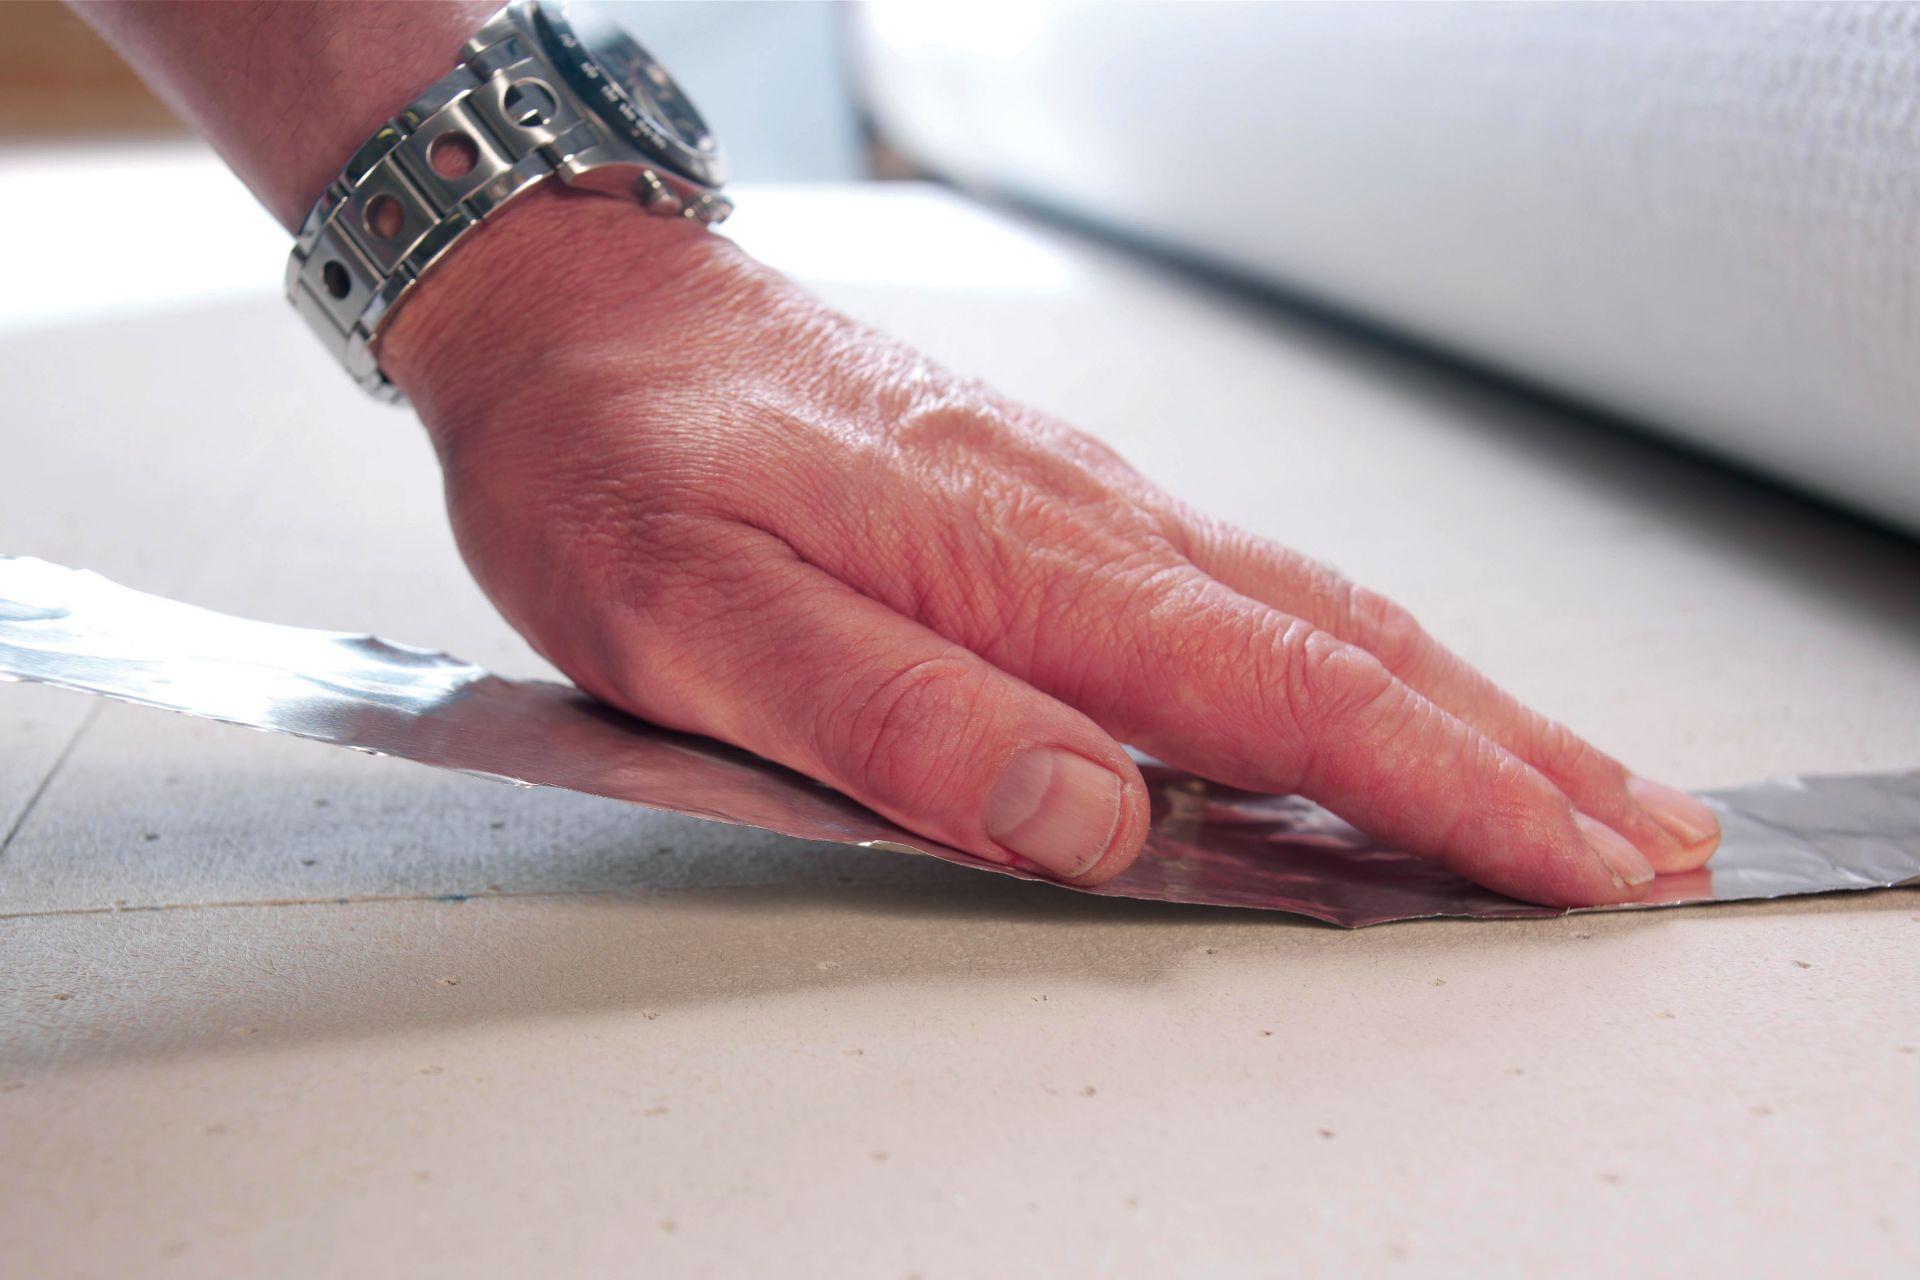 Thermal Insulation Aluminium Tape applied